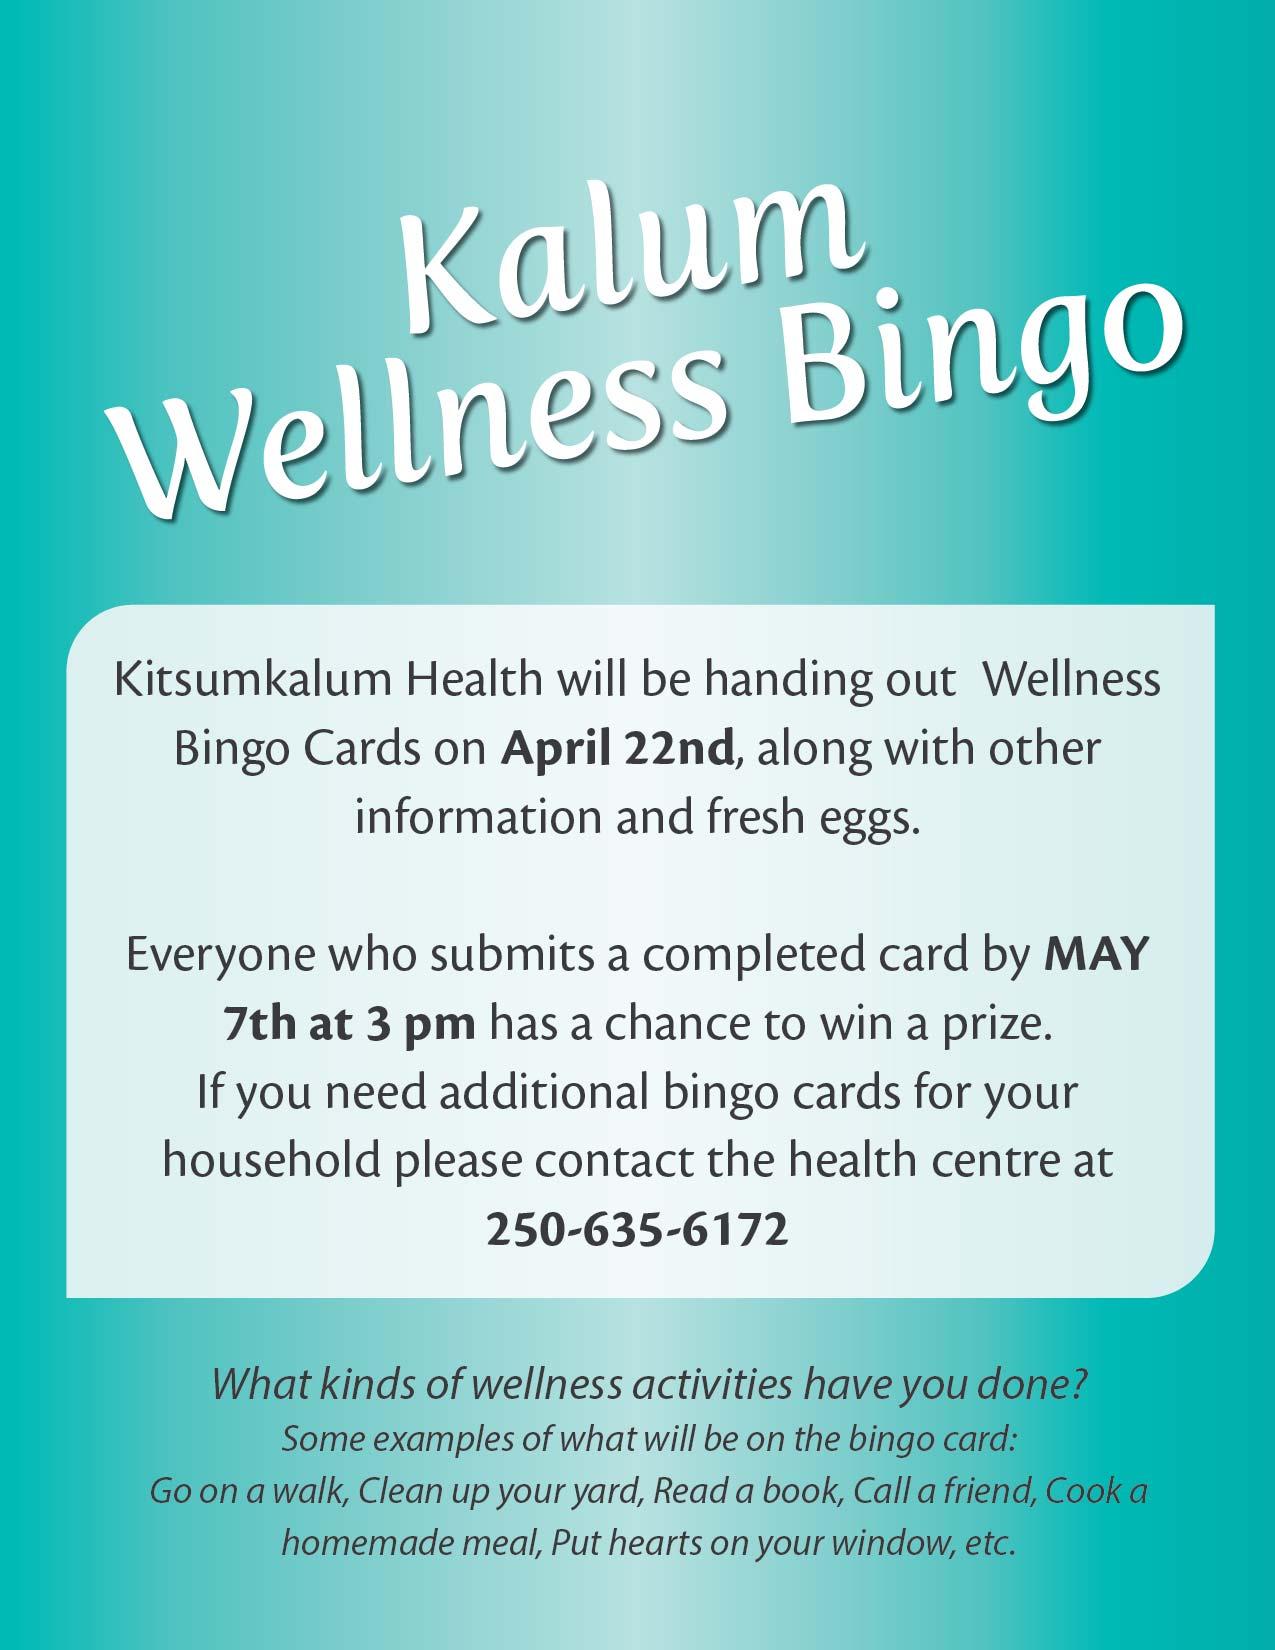 Kalum Wellness Bingo